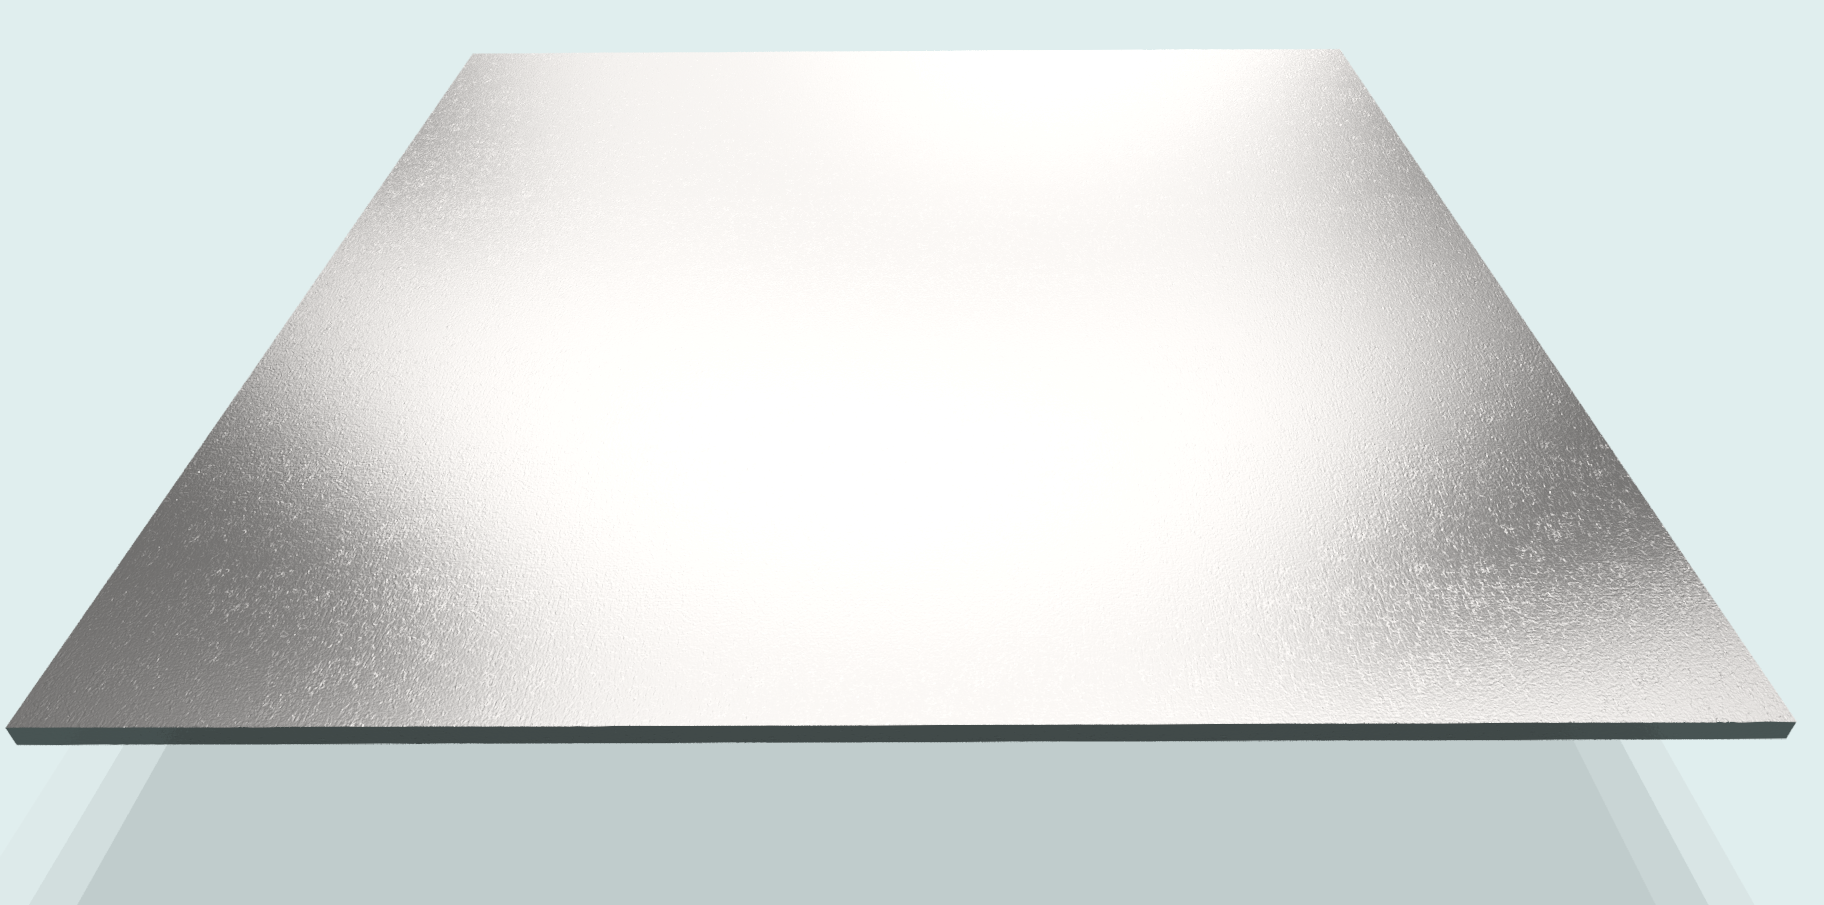 Blech 3 mm St, blank S235JR gebeizt+gefettet